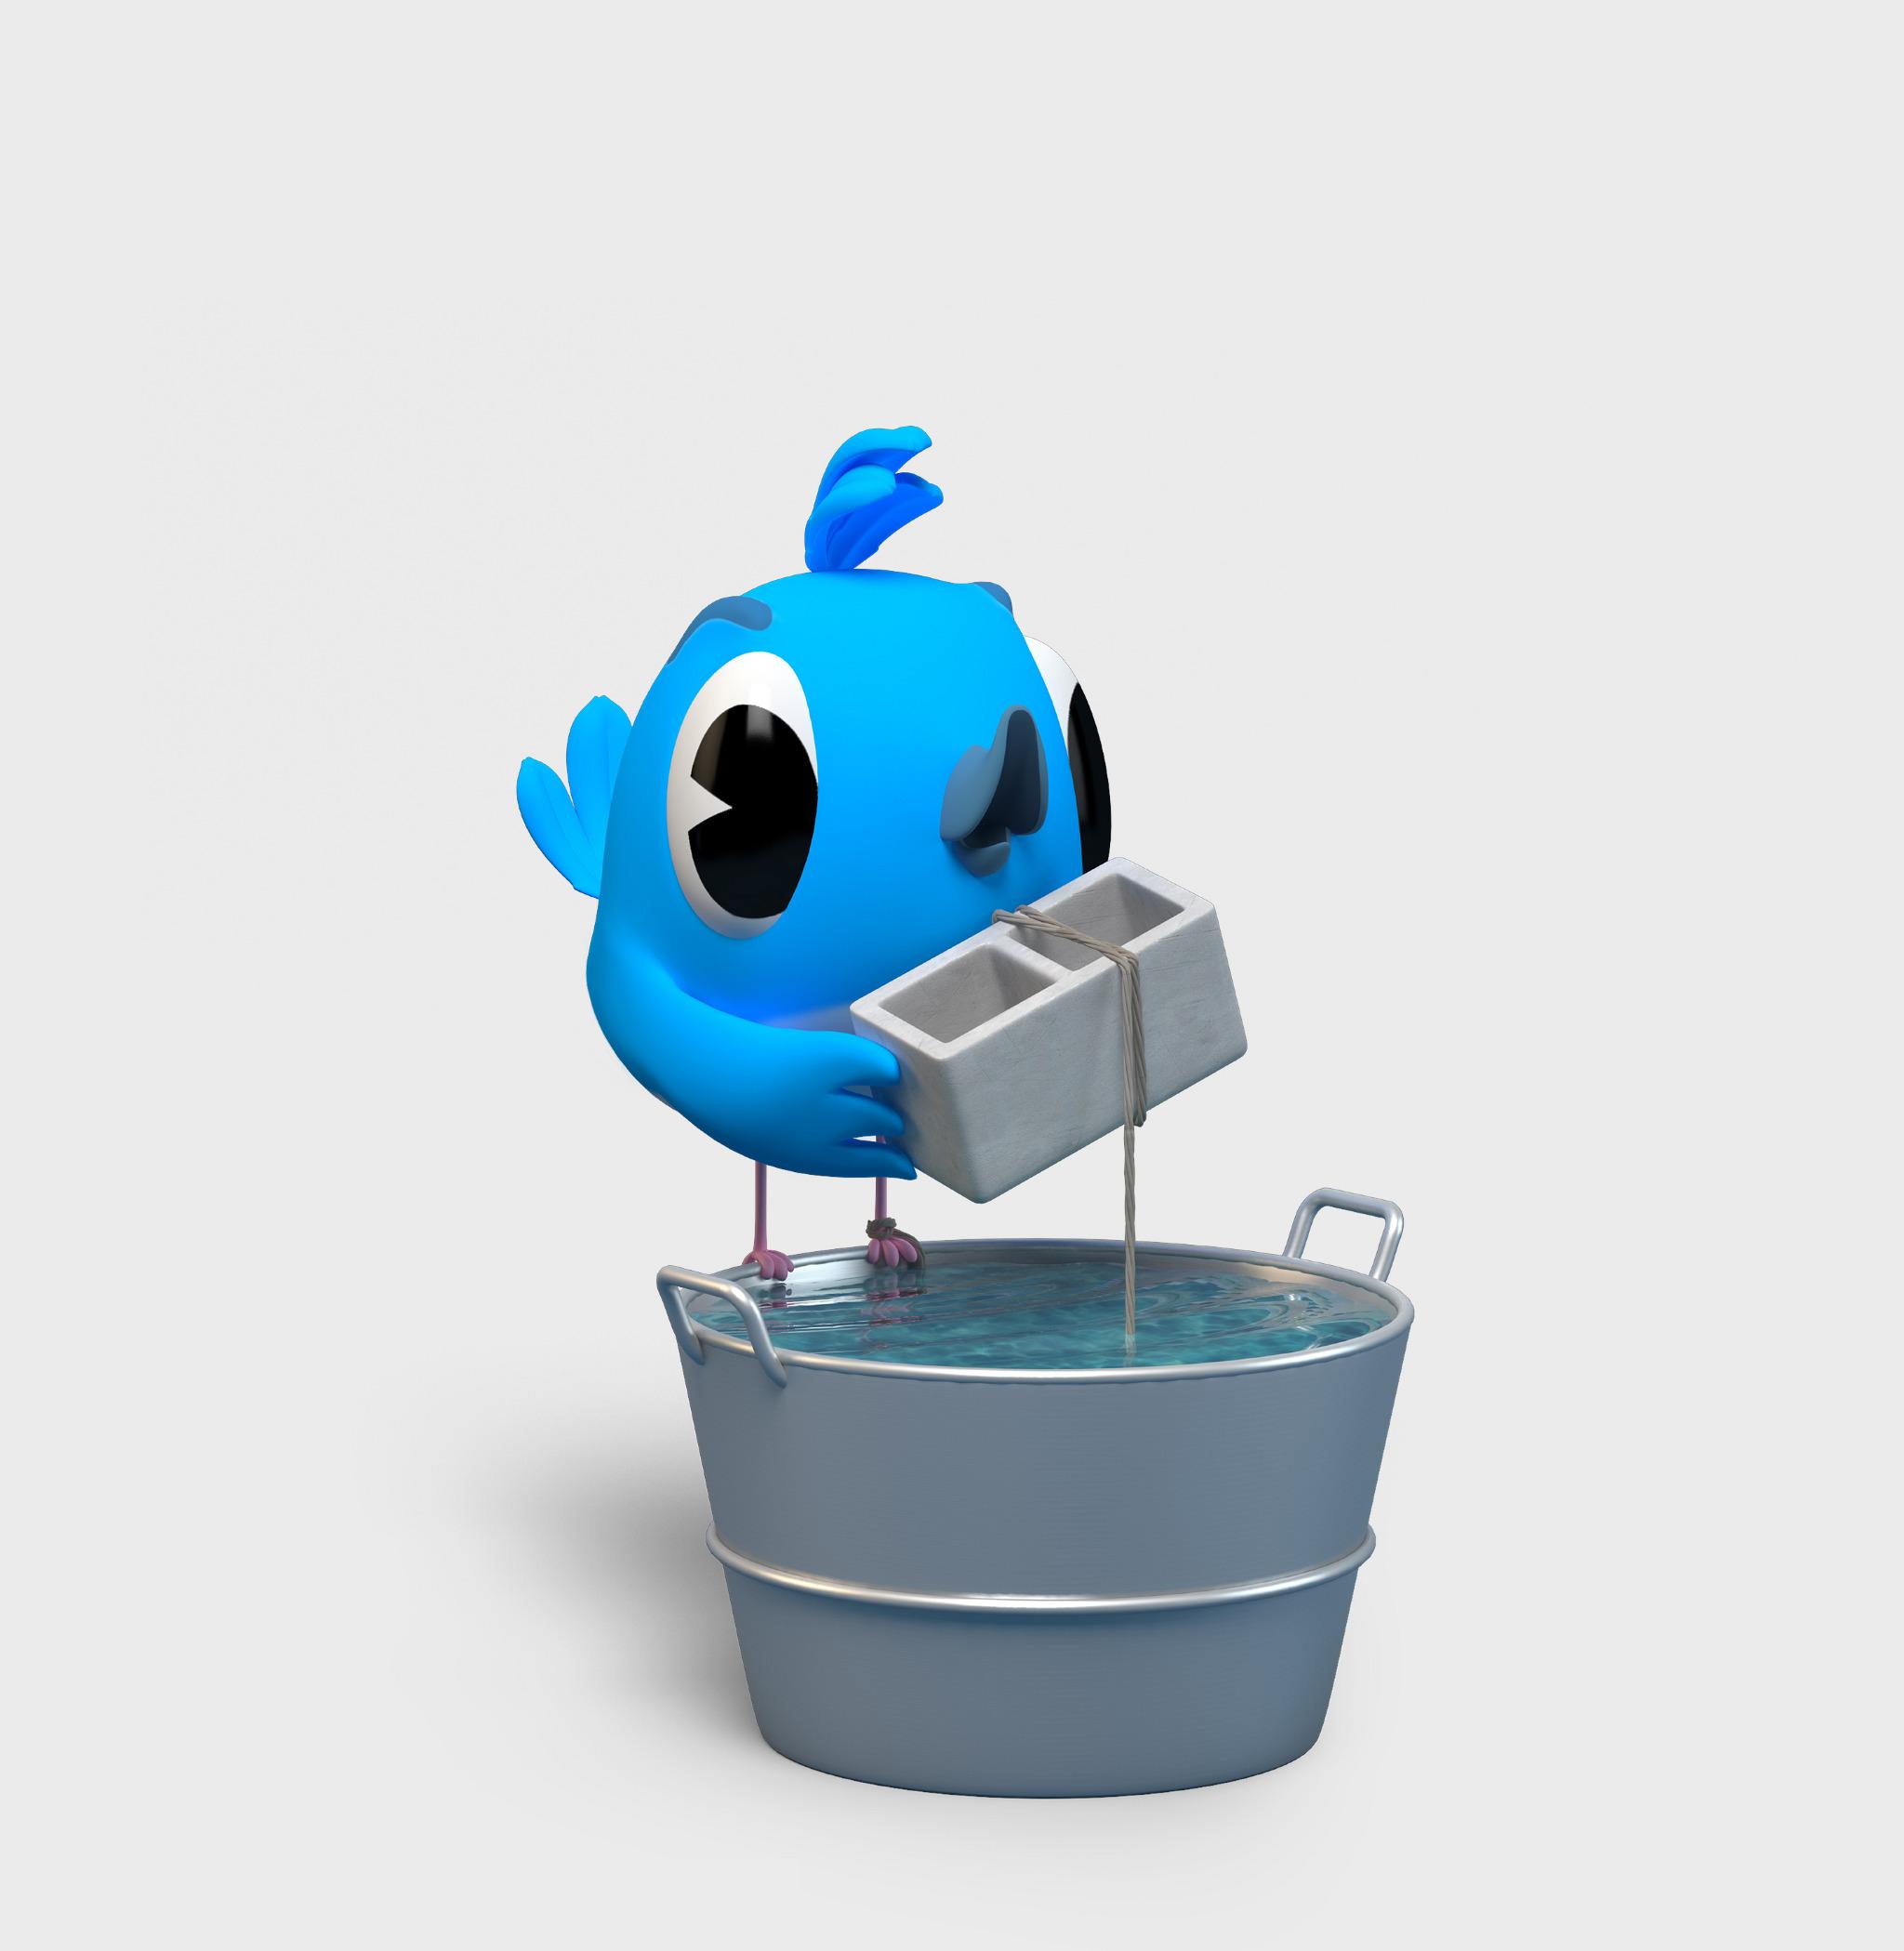 Twitter-Bird-Bloomberg-Businessweek-Bucket_o.jpg